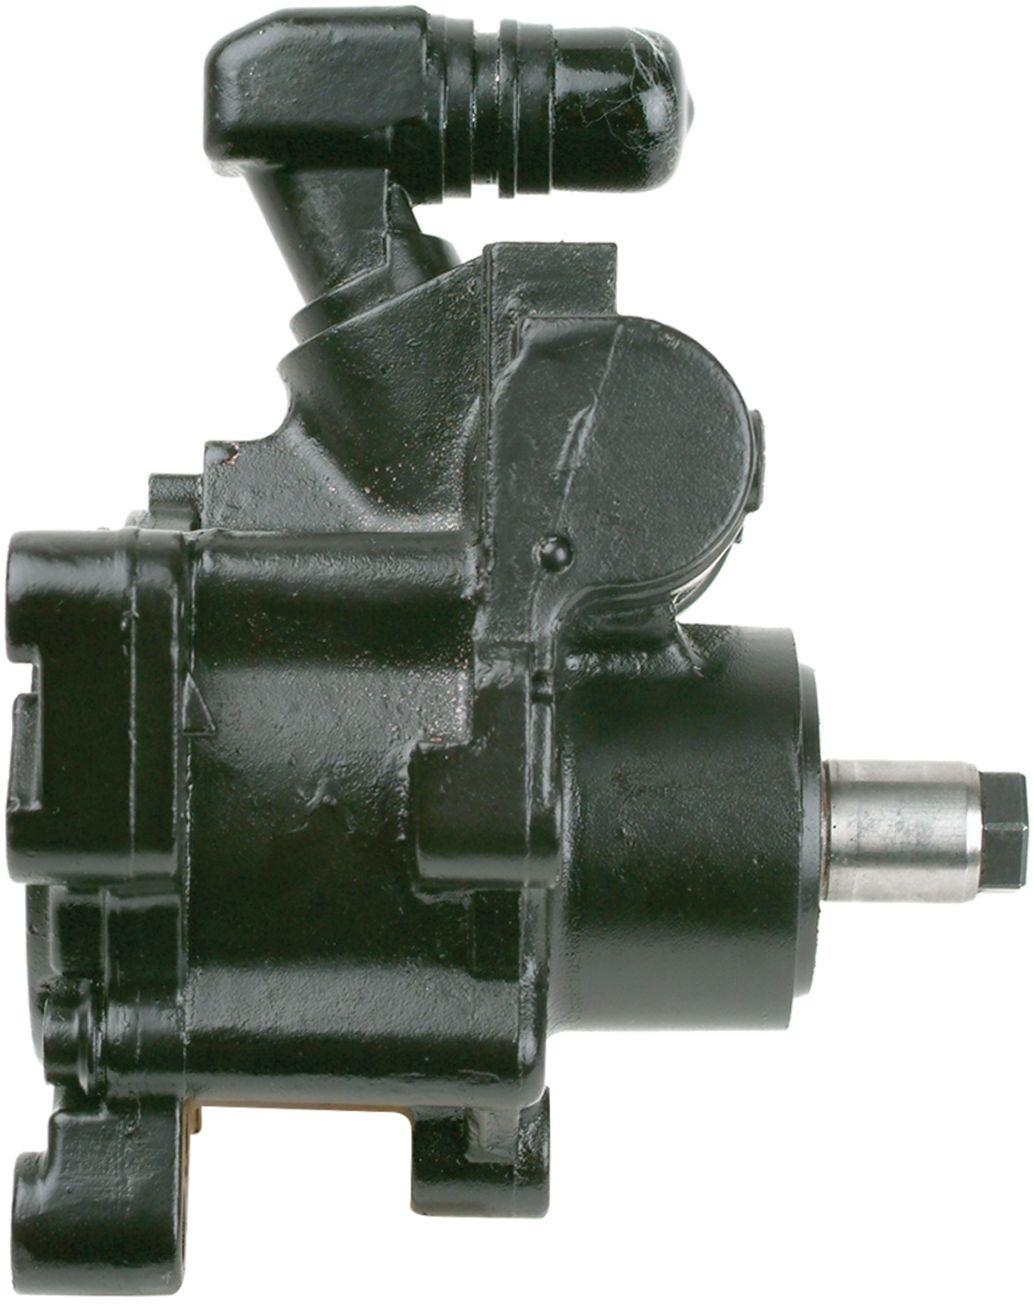 2001 Mercedes Benz Ml320 Power Steering Pump 01 Fuel Filter Location A1 21 5294